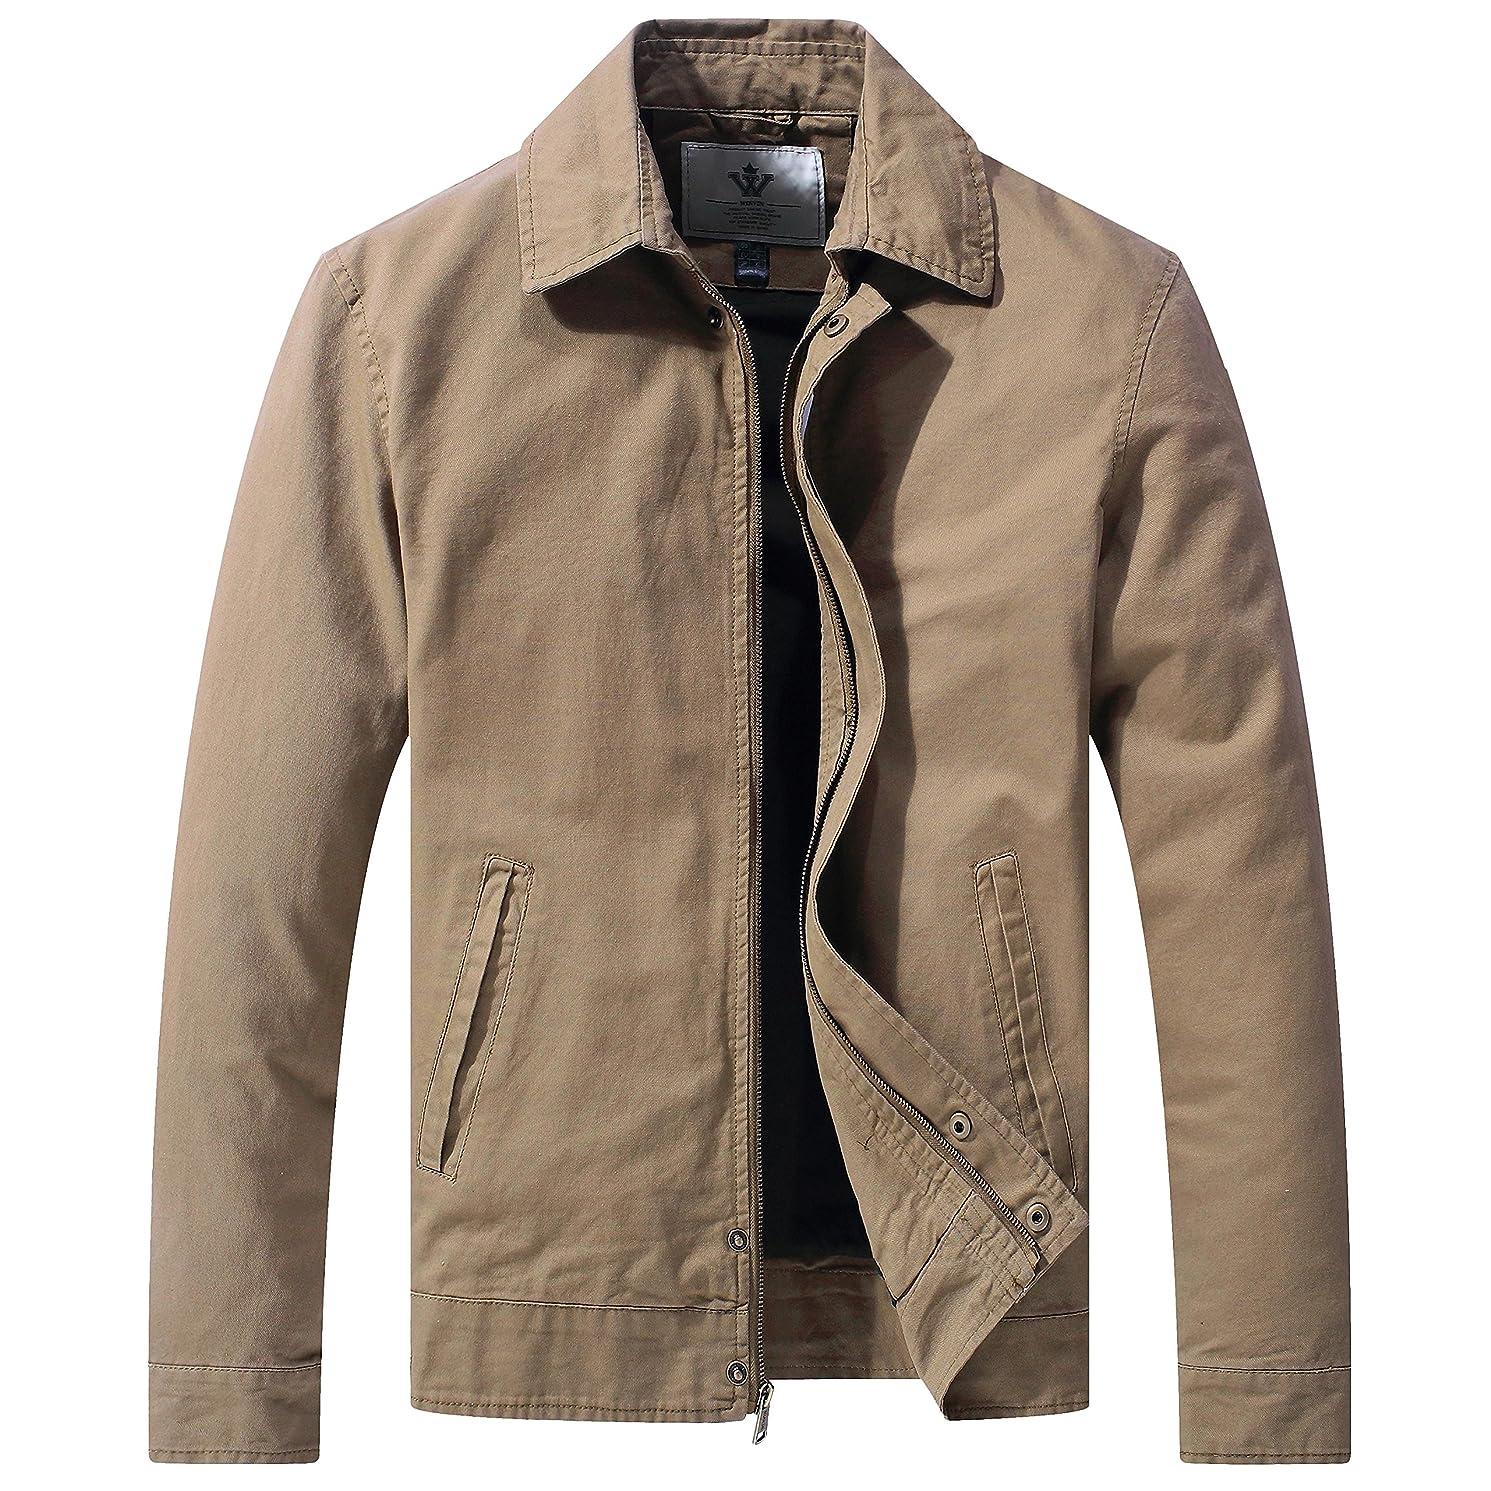 WenVen Men's Spring Lightweight Long Sleeve Full Zip Jacket with Pockets